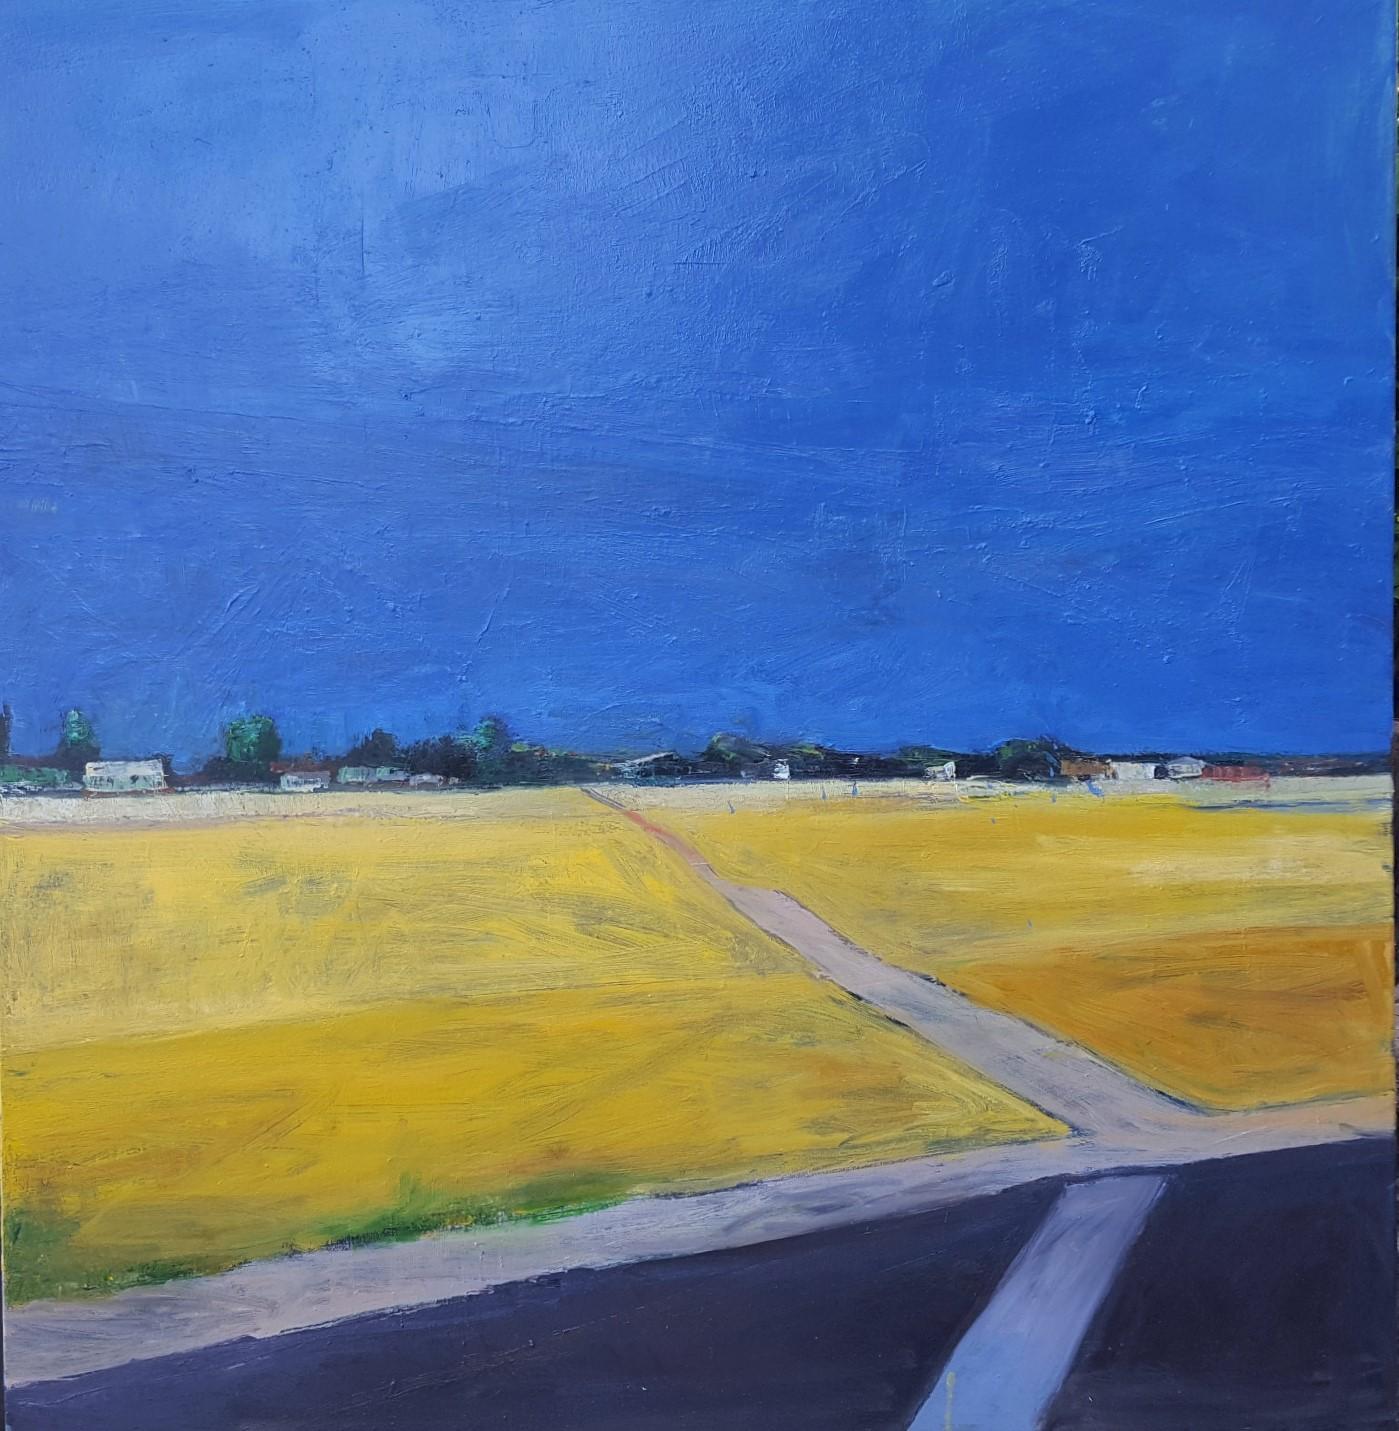 "Planada     2019  oil on canvas  46"" x 44""  $4000"